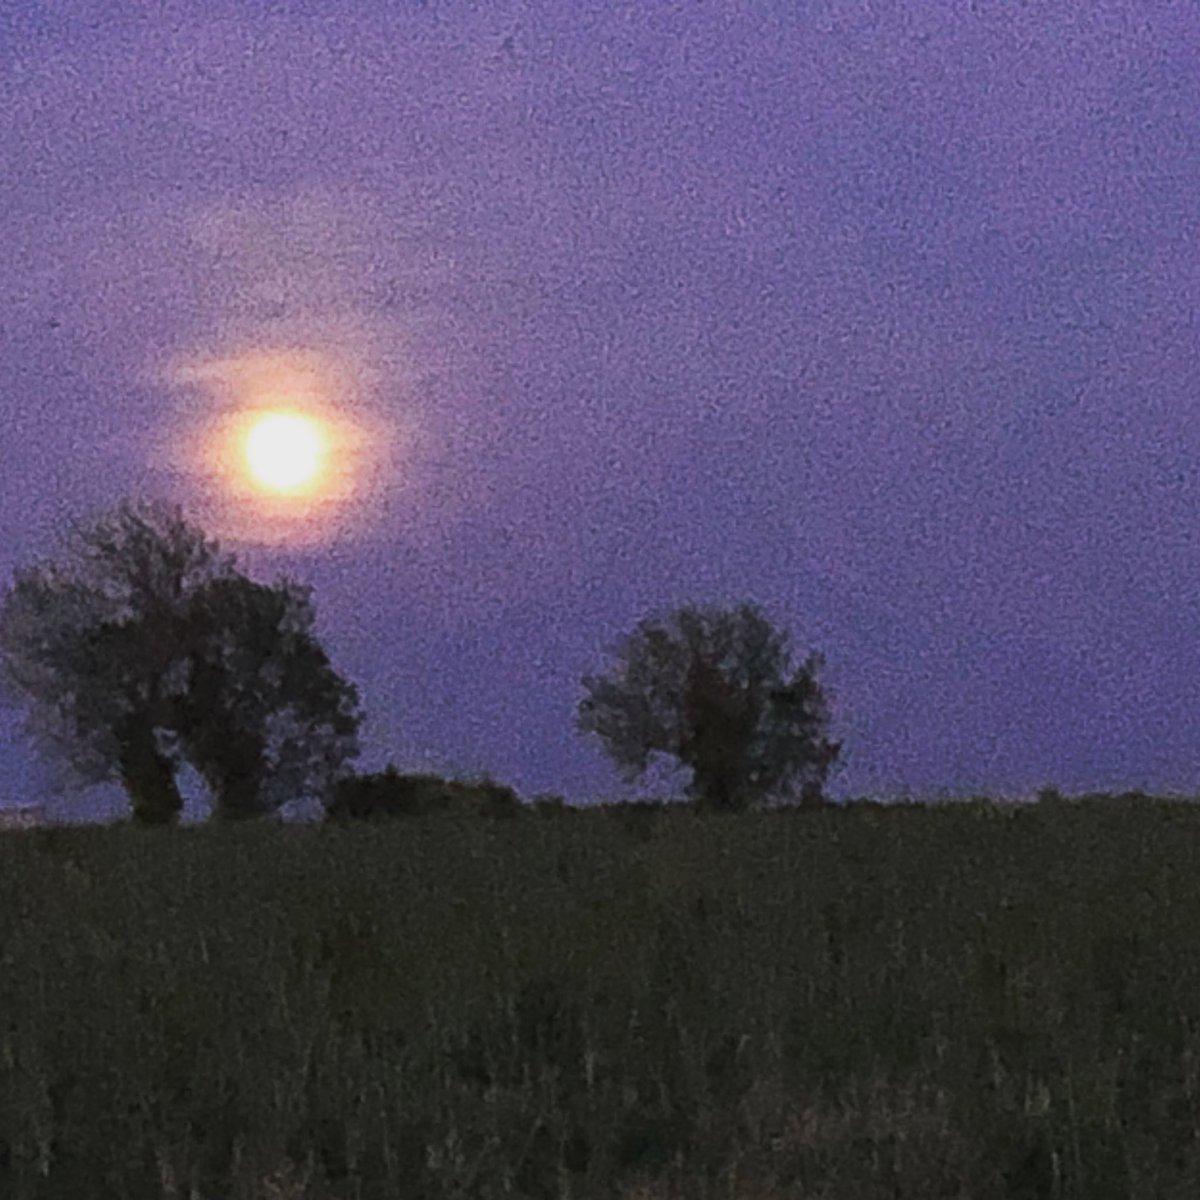 I hope you're all enjoying that beautiful #moon this evening...   #flowermoon  #fullmoon🌕 #ig_moonshots #moon #moonlight #moon_of_the_day #moonphotography